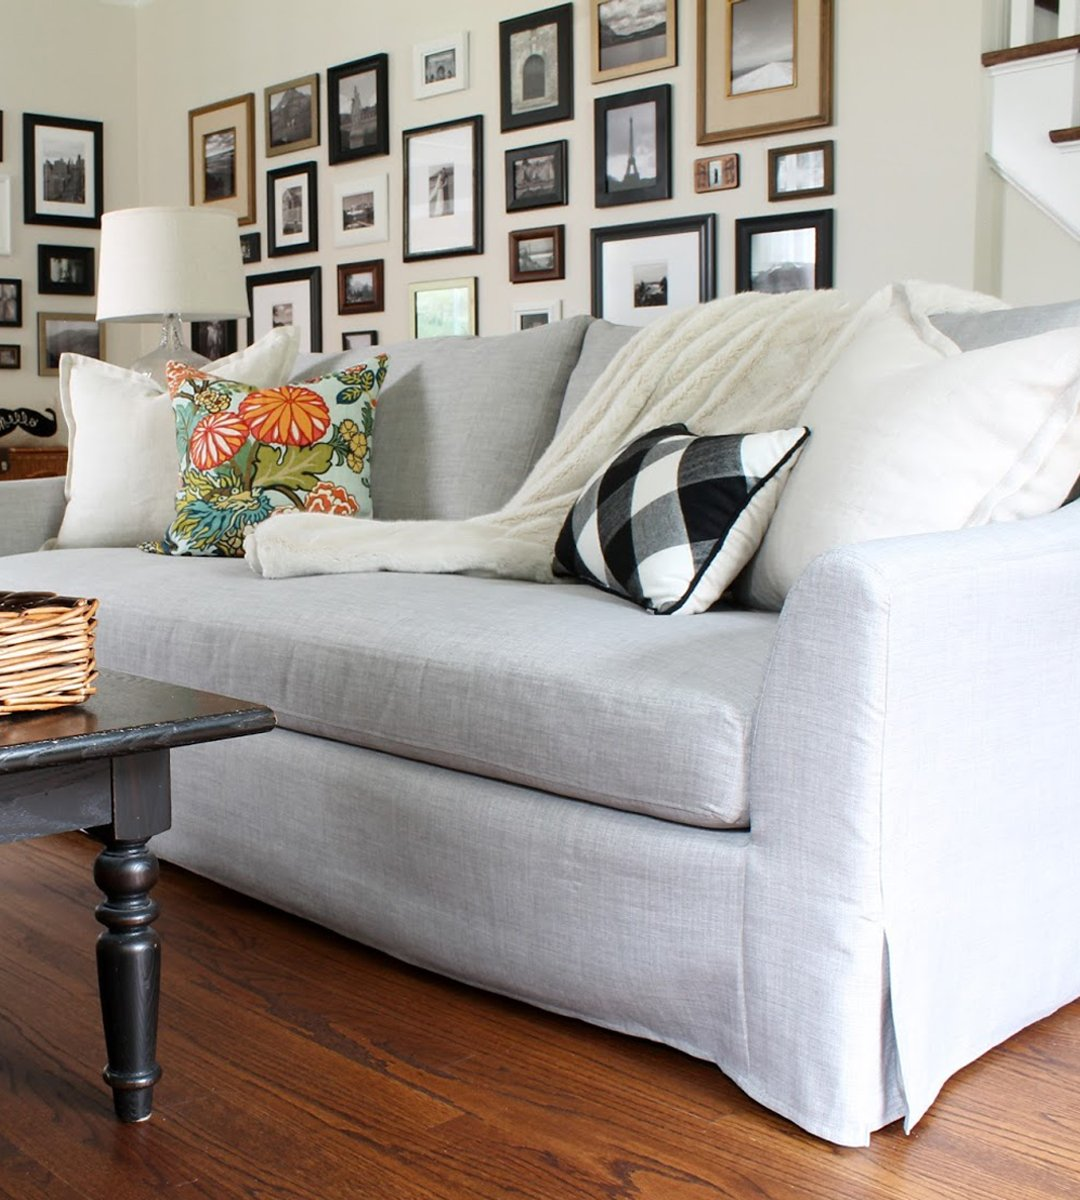 Restoration Hardware Slipcovers | Comfort Works